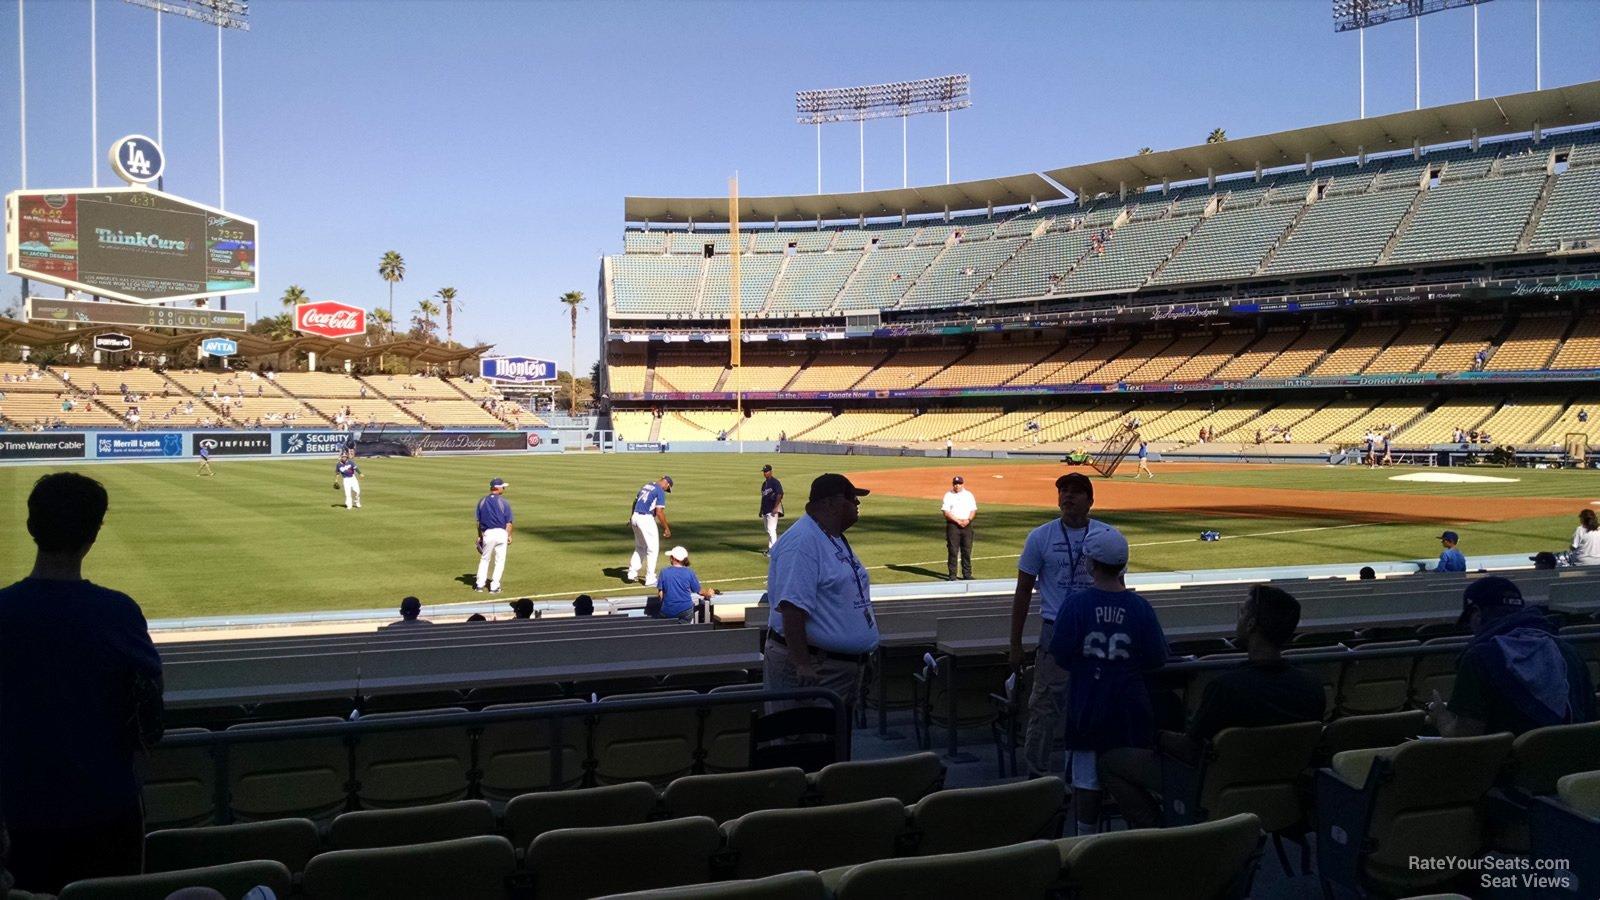 Dodger Stadium Section 39 - RateYourSeats.com